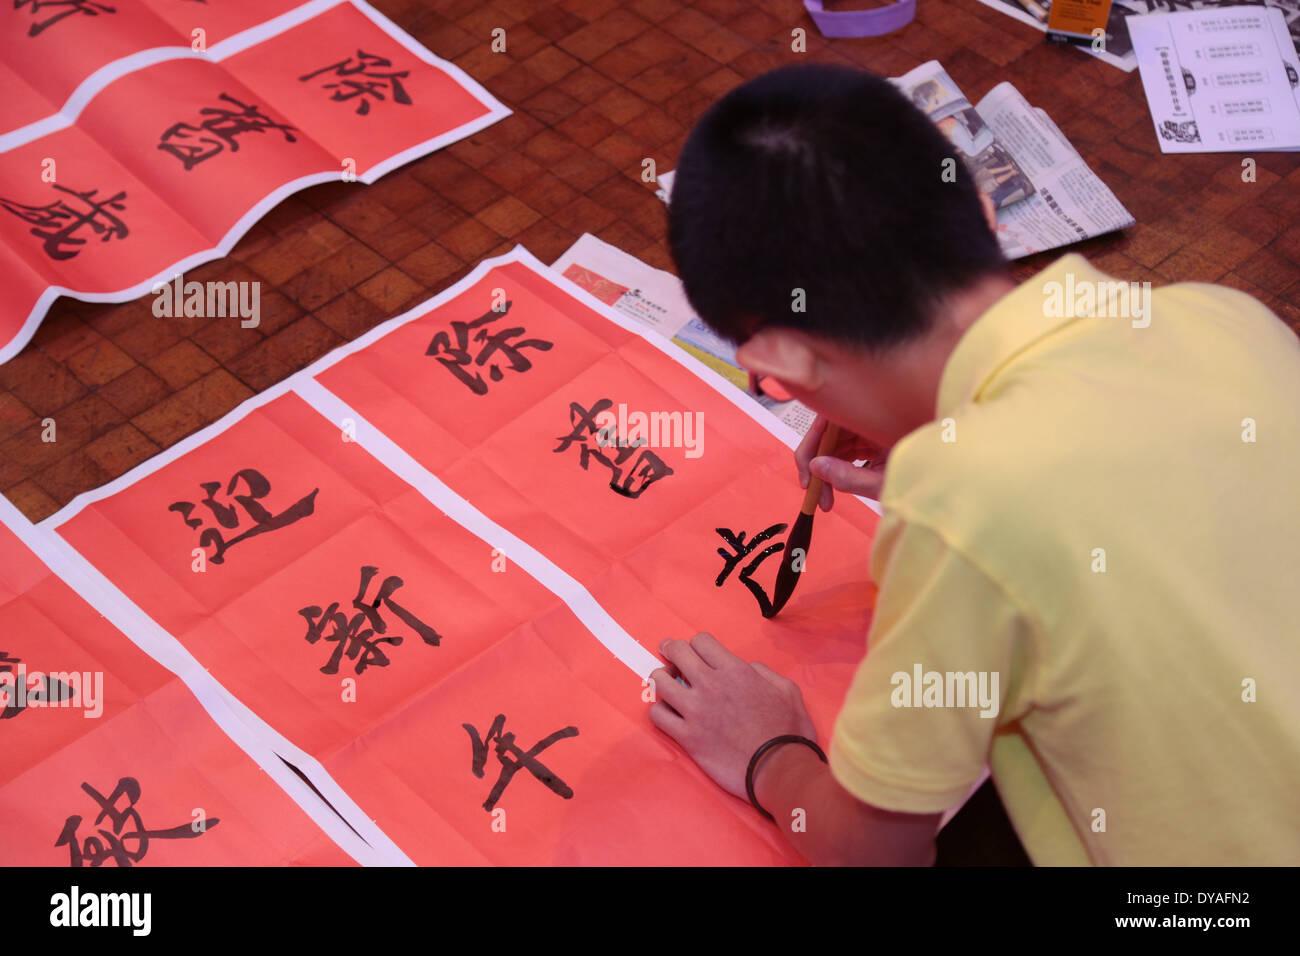 Nab karachi organized an inter schools calligraphy competition